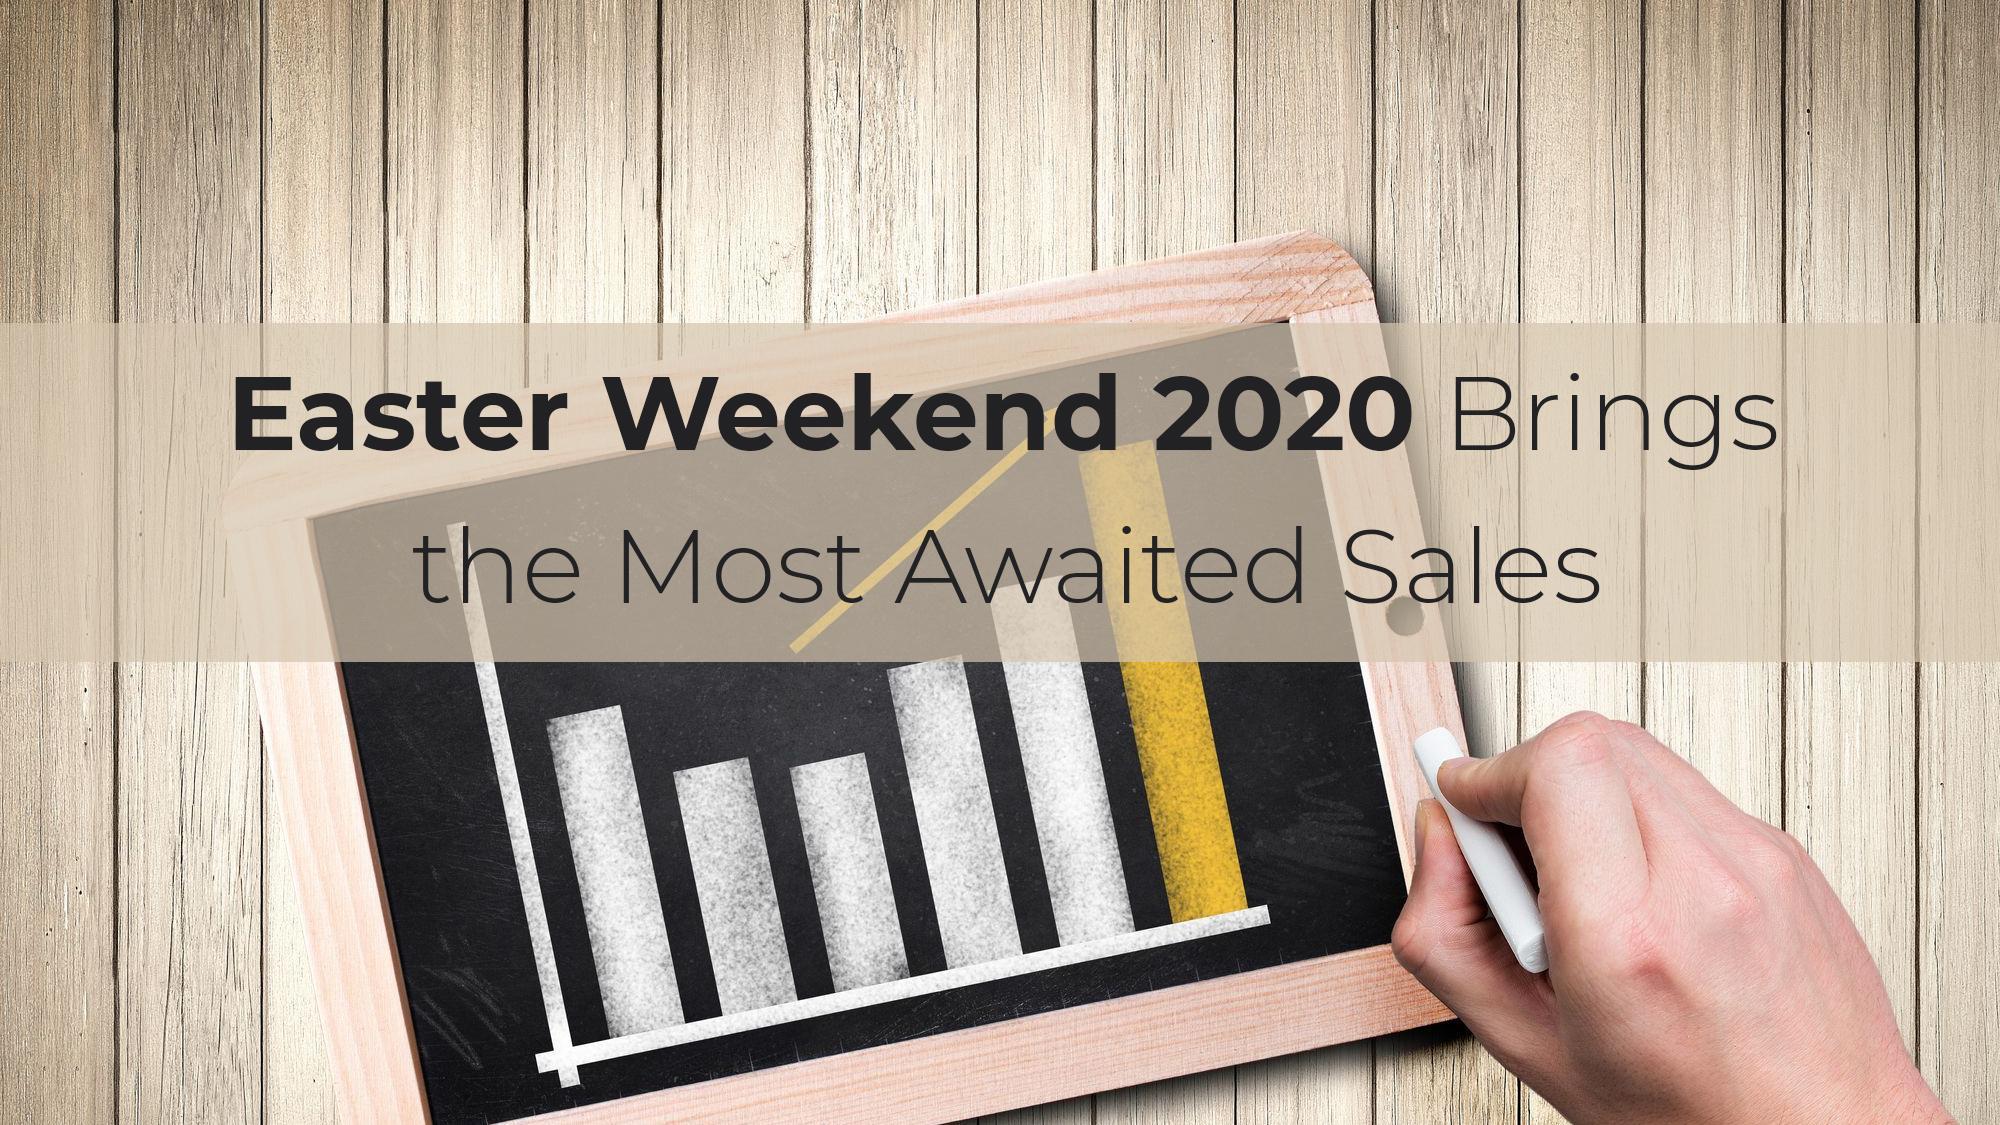 Easter Weekend 2020 Brings the Most Awaited Sales